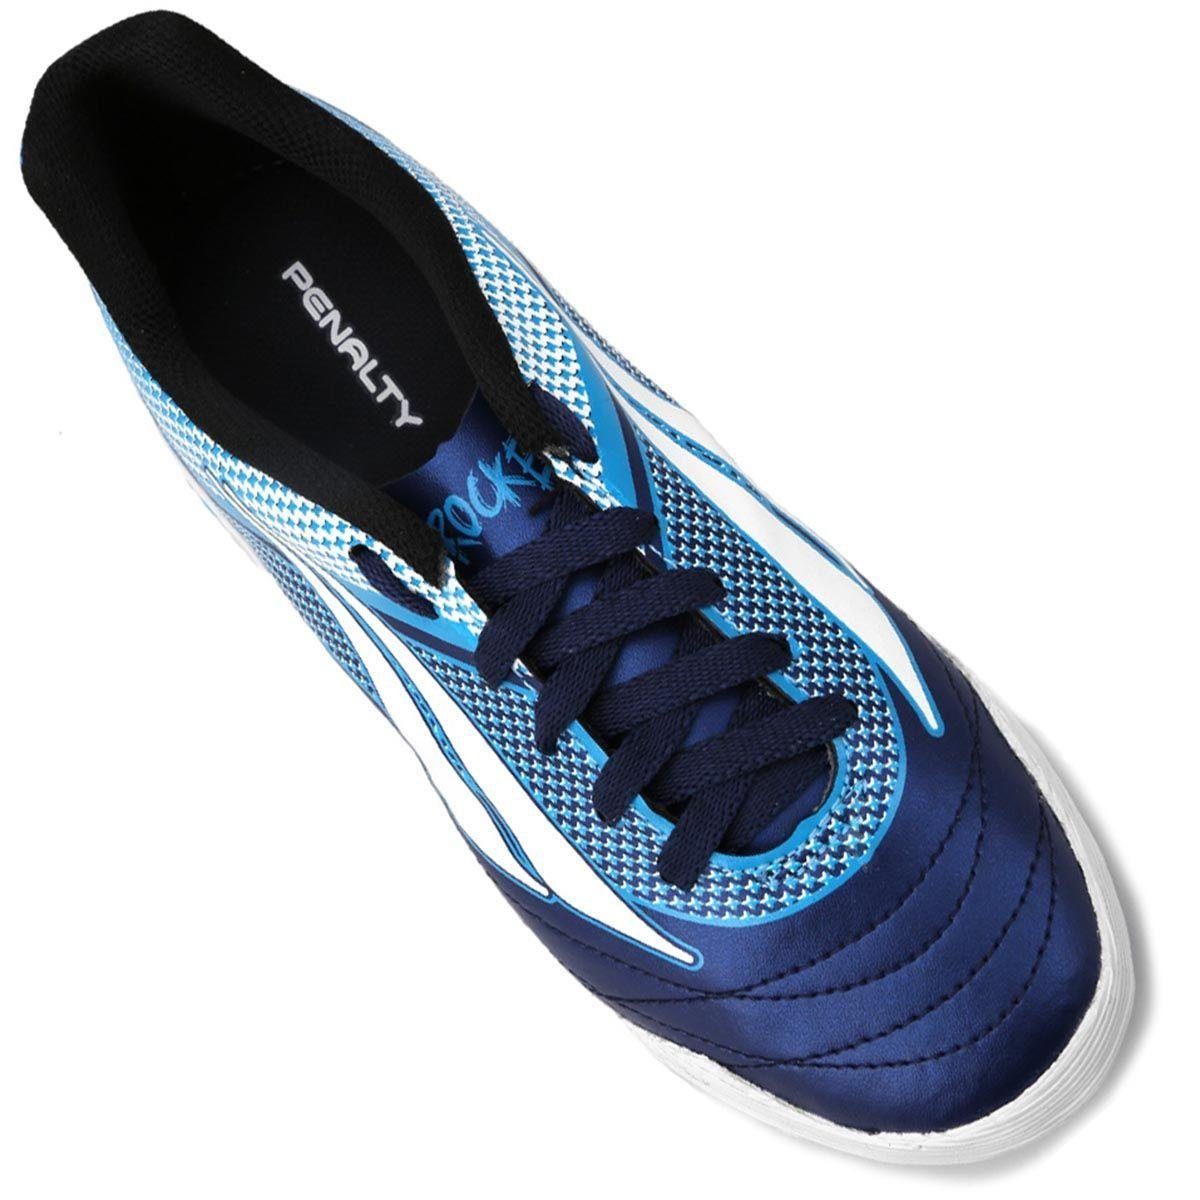 Chuteira Futsal Infantil Penalty ATF K Rocket 7 - Marinho e Azul ... 9c14733826a87